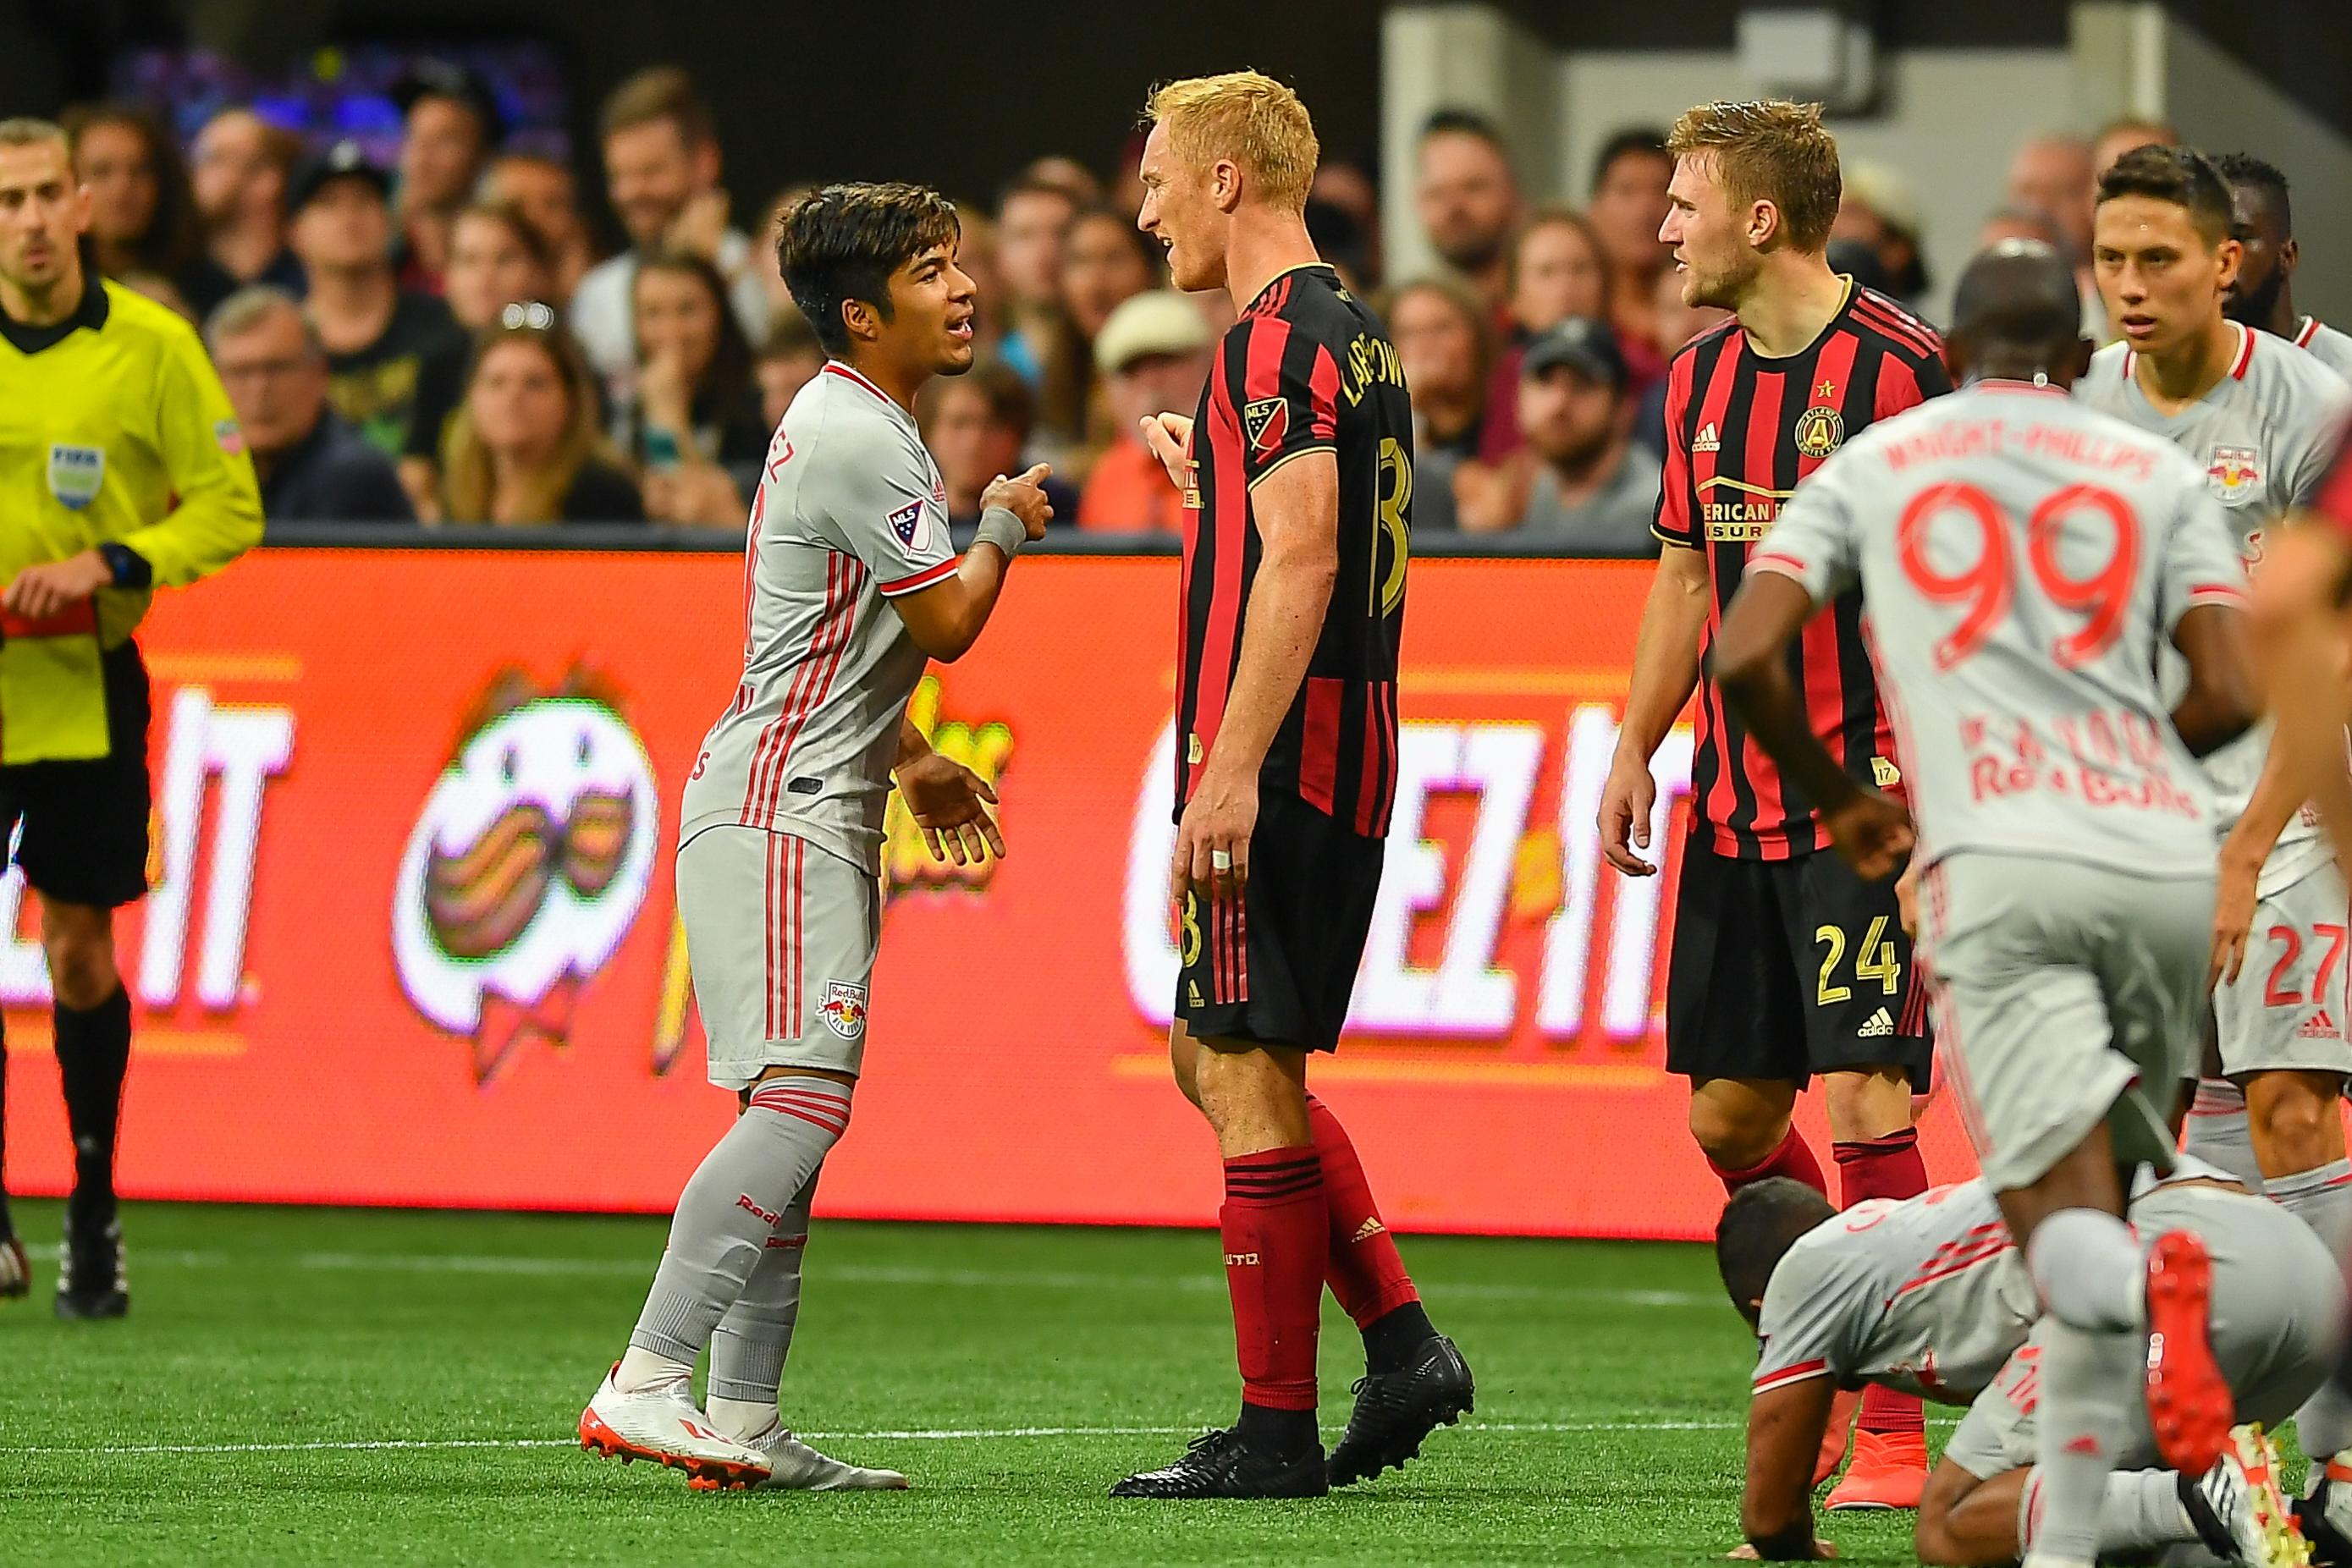 SOCCER: JUL 07 MLS - New York Red Bulls at Atlanta United FC